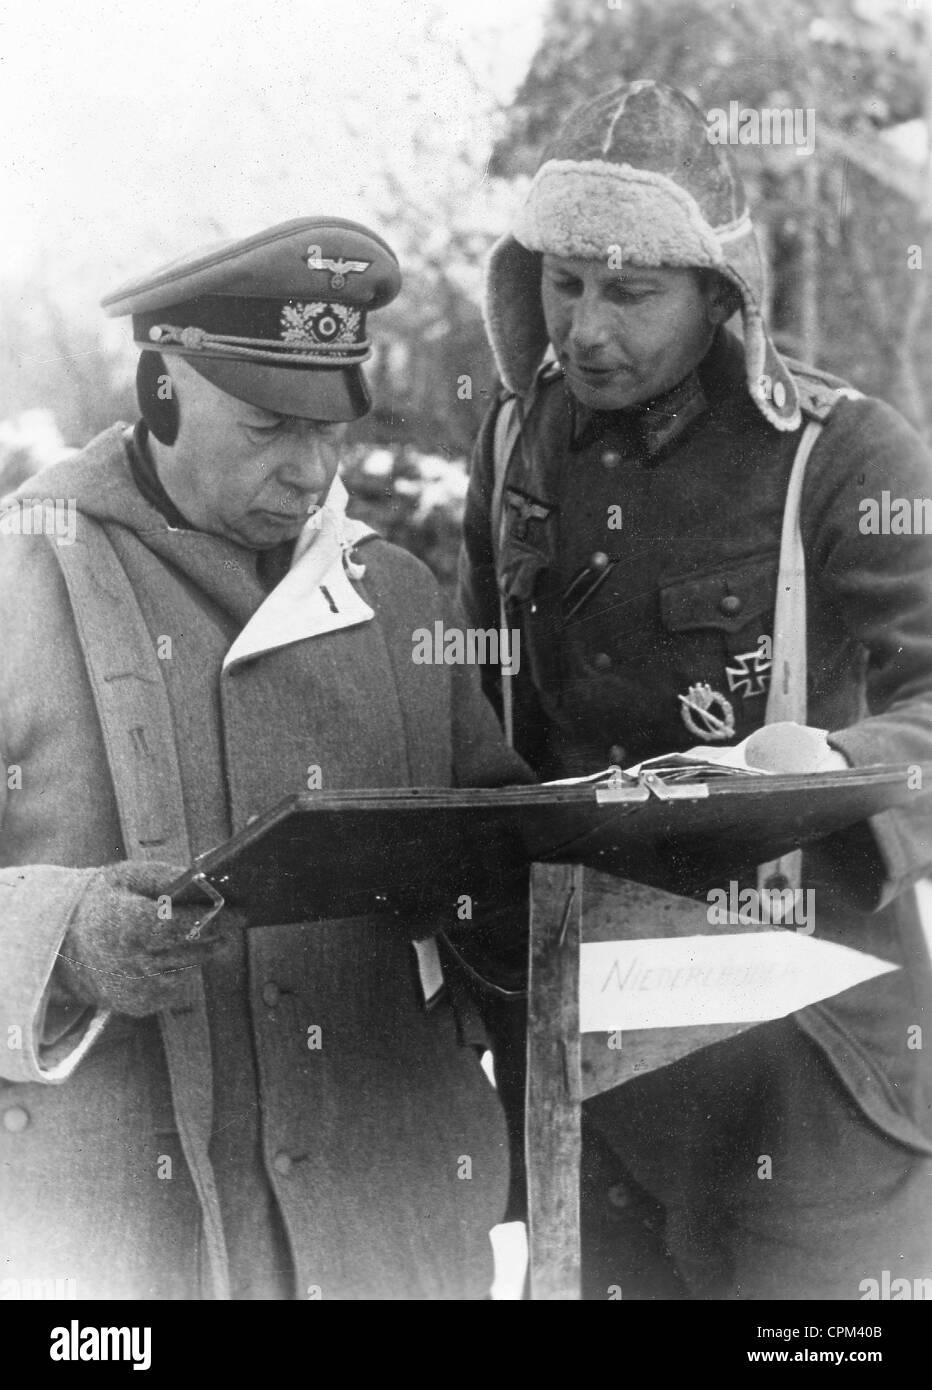 Lieutenant General Lucht with Captain Horst Niederlaender, 1943 Stock Photo